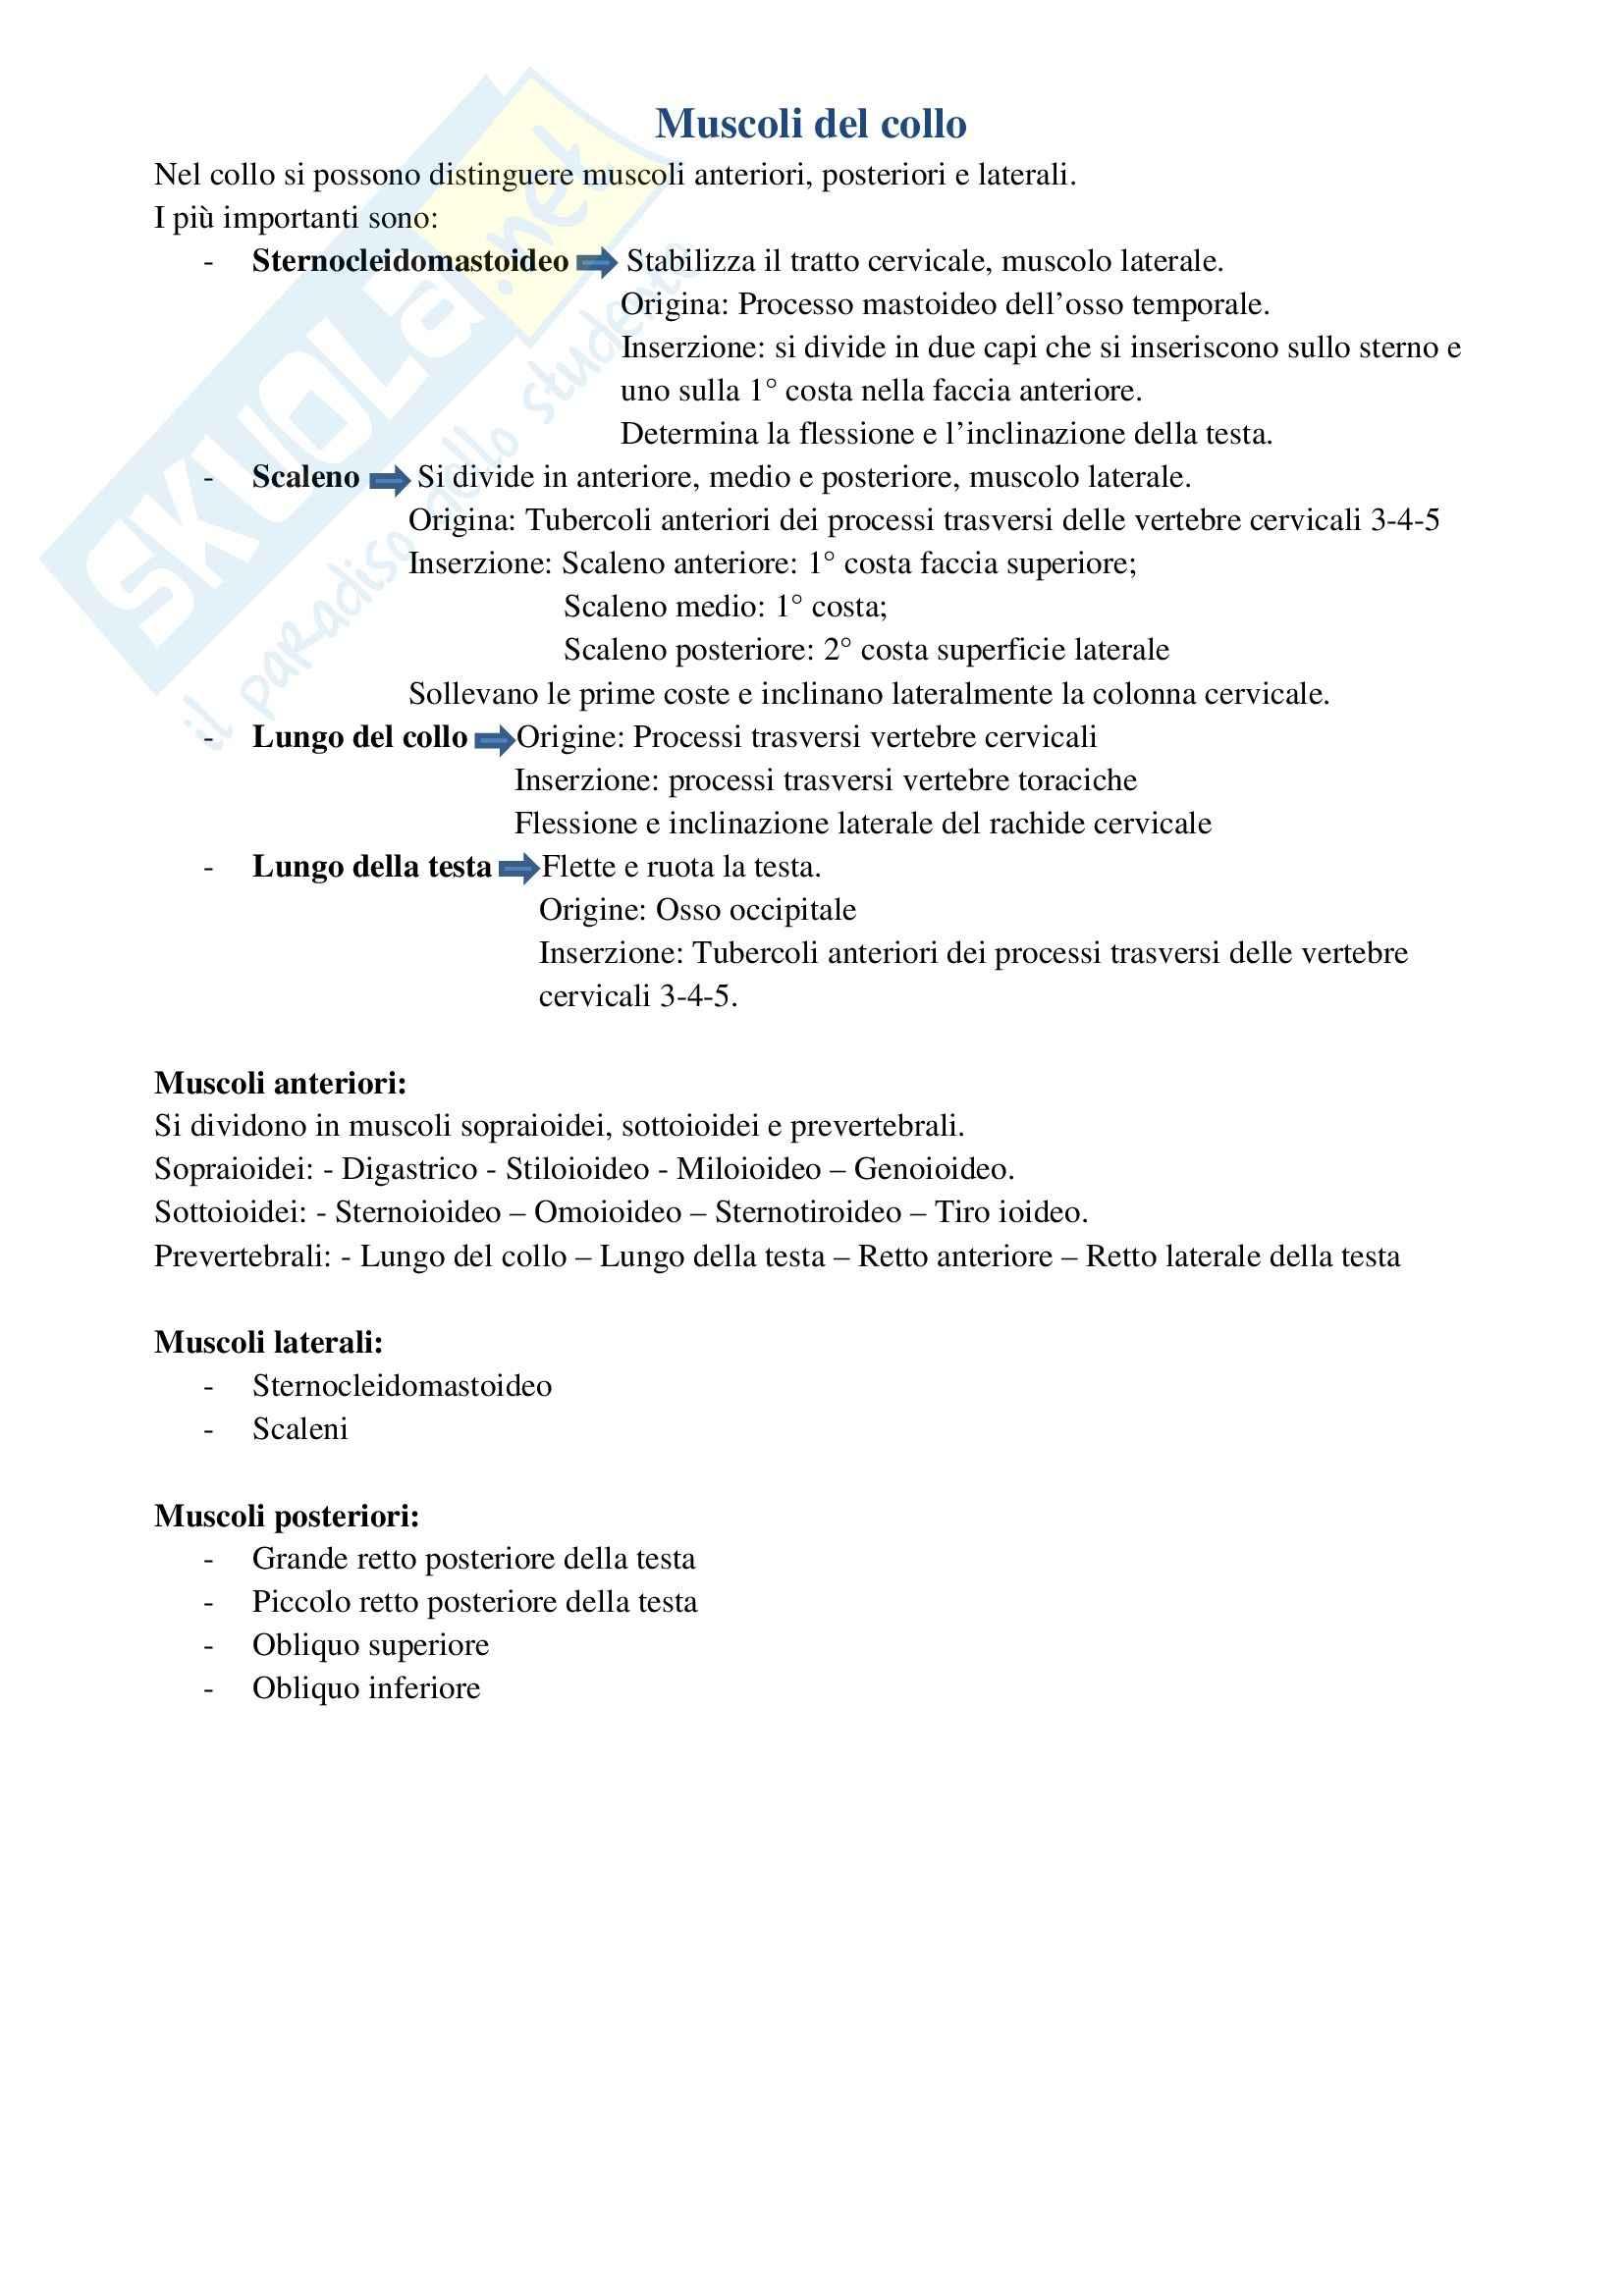 Riassunto esame Anatomia umana, prof. Ripani, libro consigliato Anatomia clinica, Marinozzi